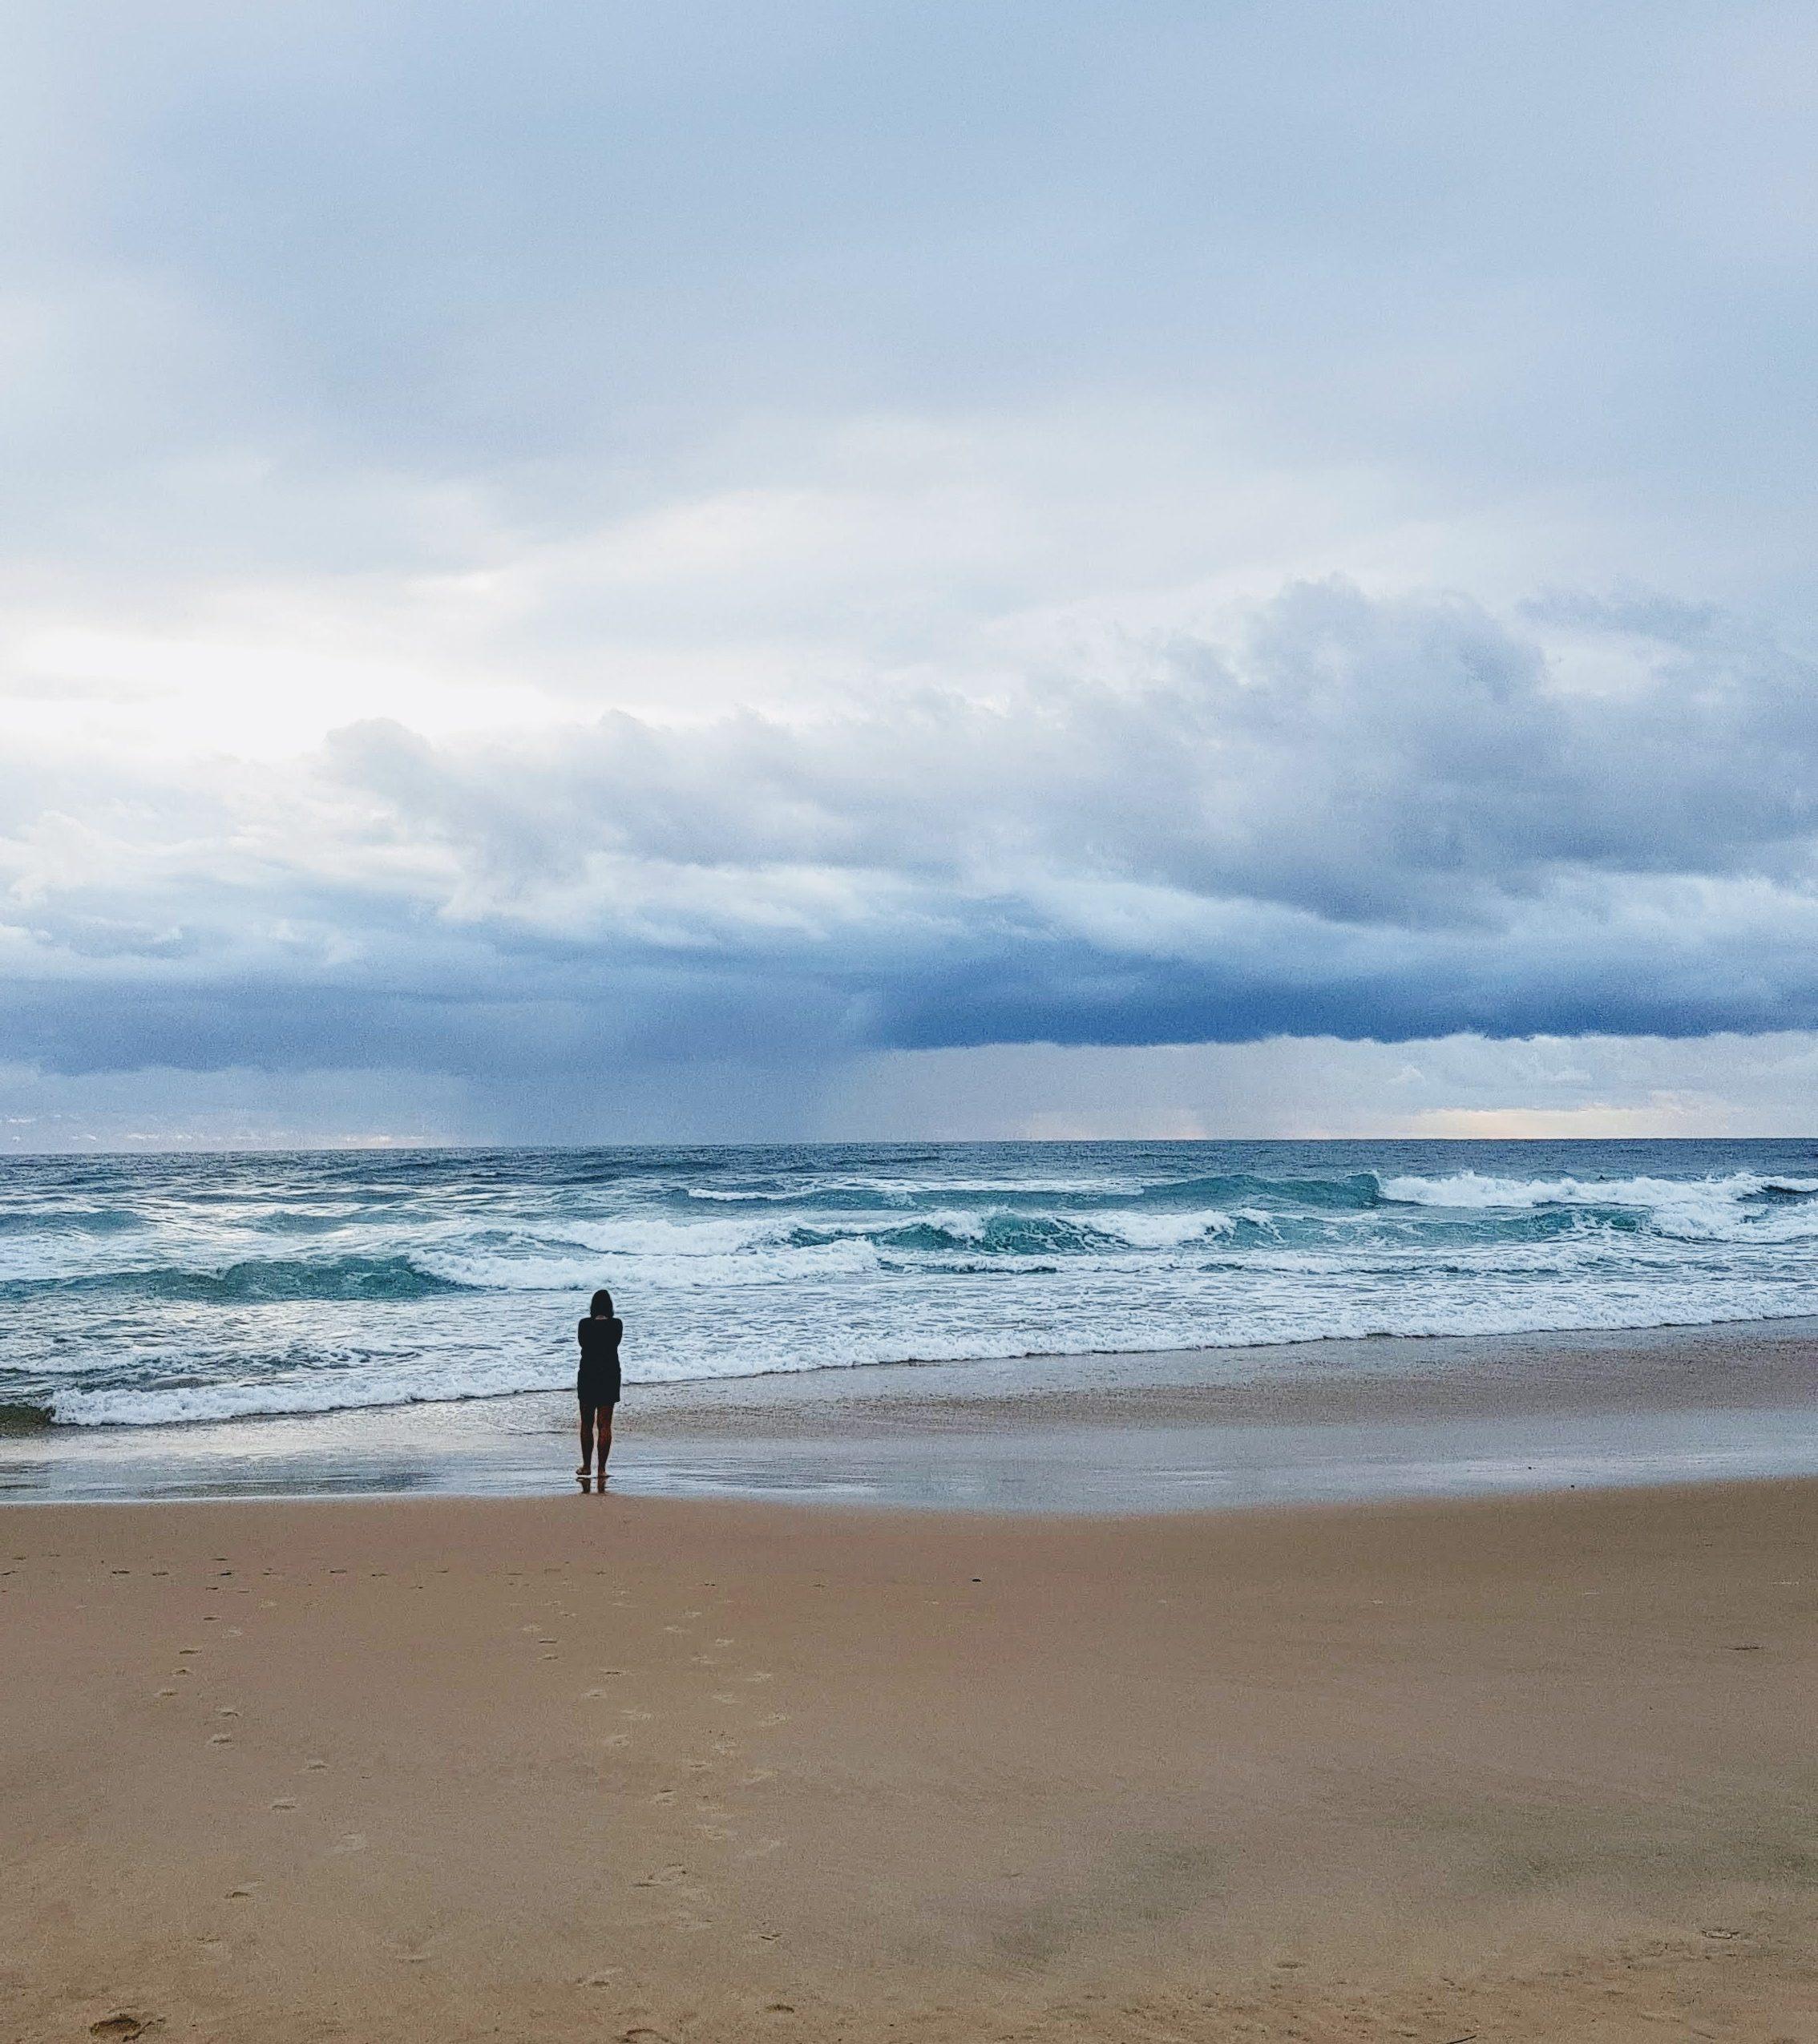 abundant life advice psychic meditation why visualisation beach nature samantha clark